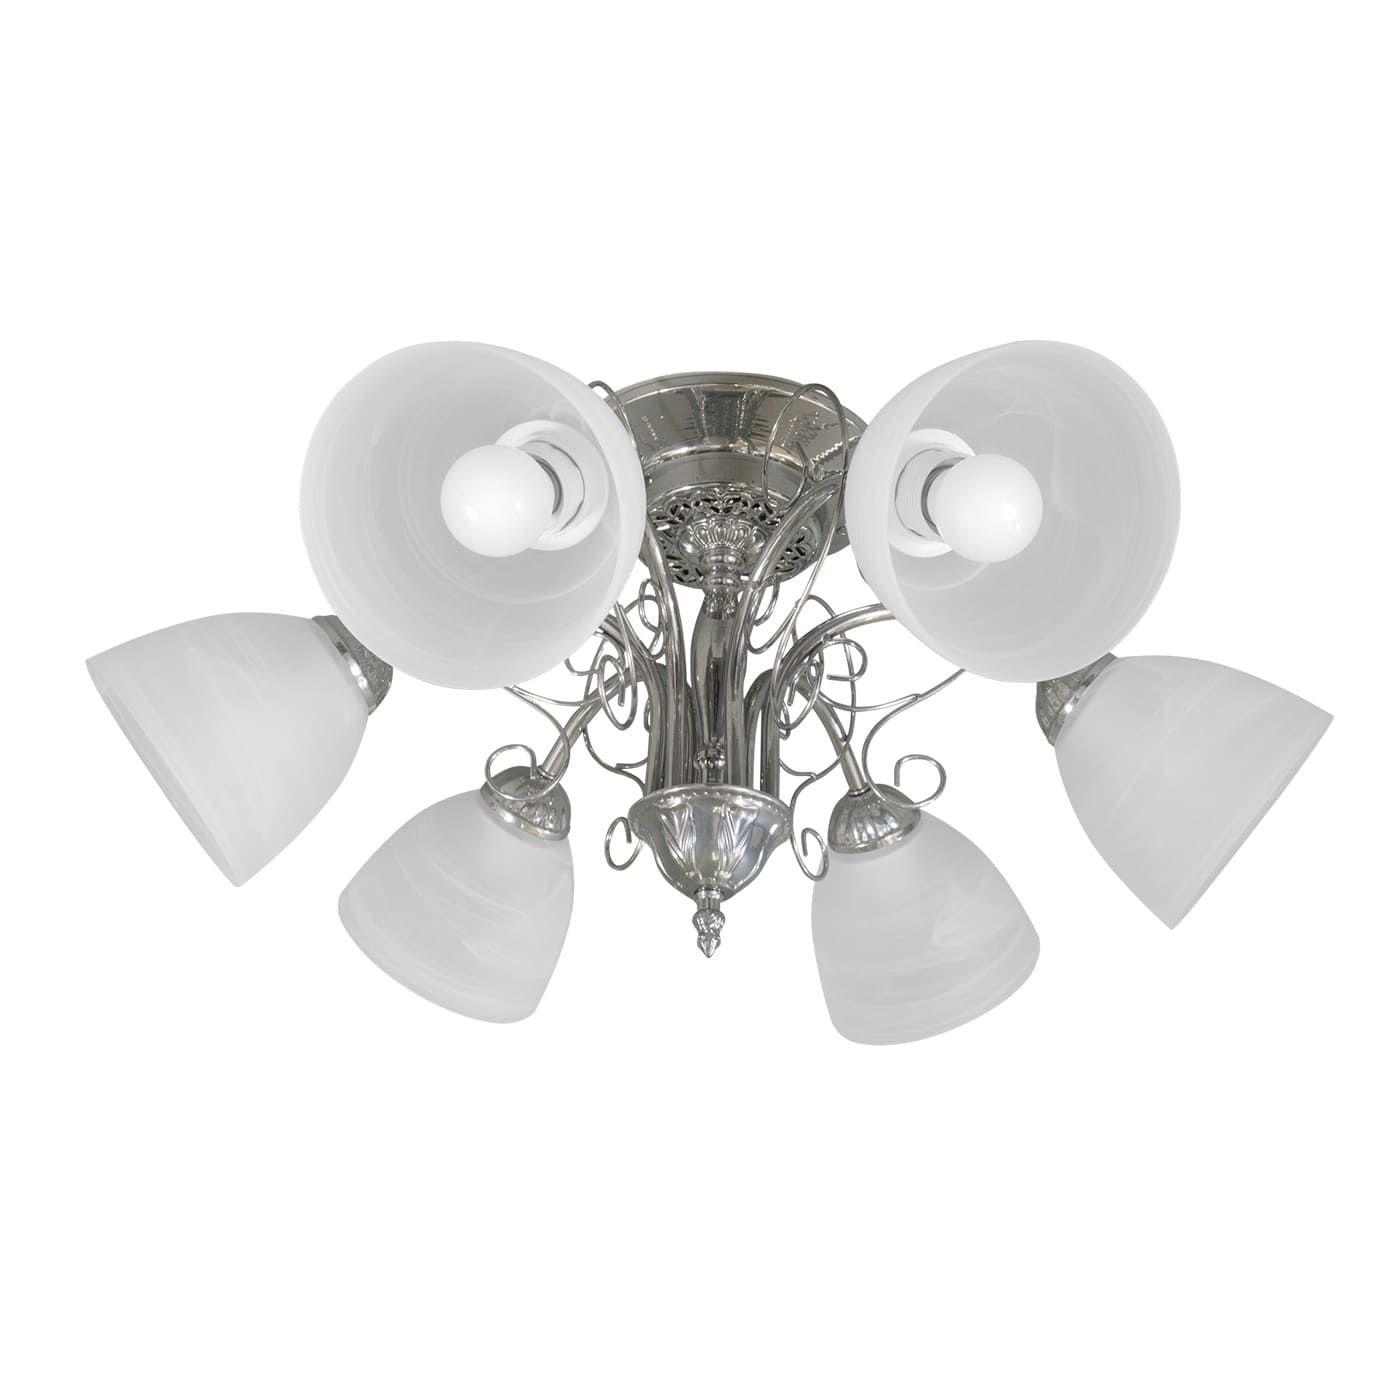 PETRASVET / Ceiling chandelier S2106-6, 6xE27 max. 60W